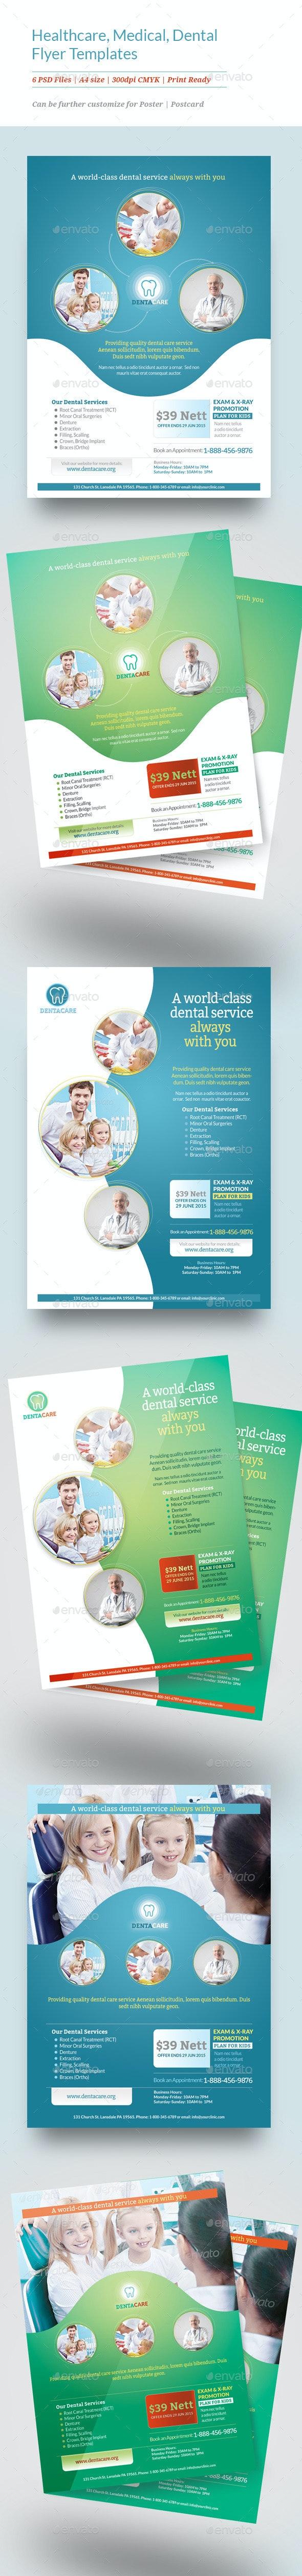 Healthcare, Medical, Dental Flyer Templates - Corporate Flyers